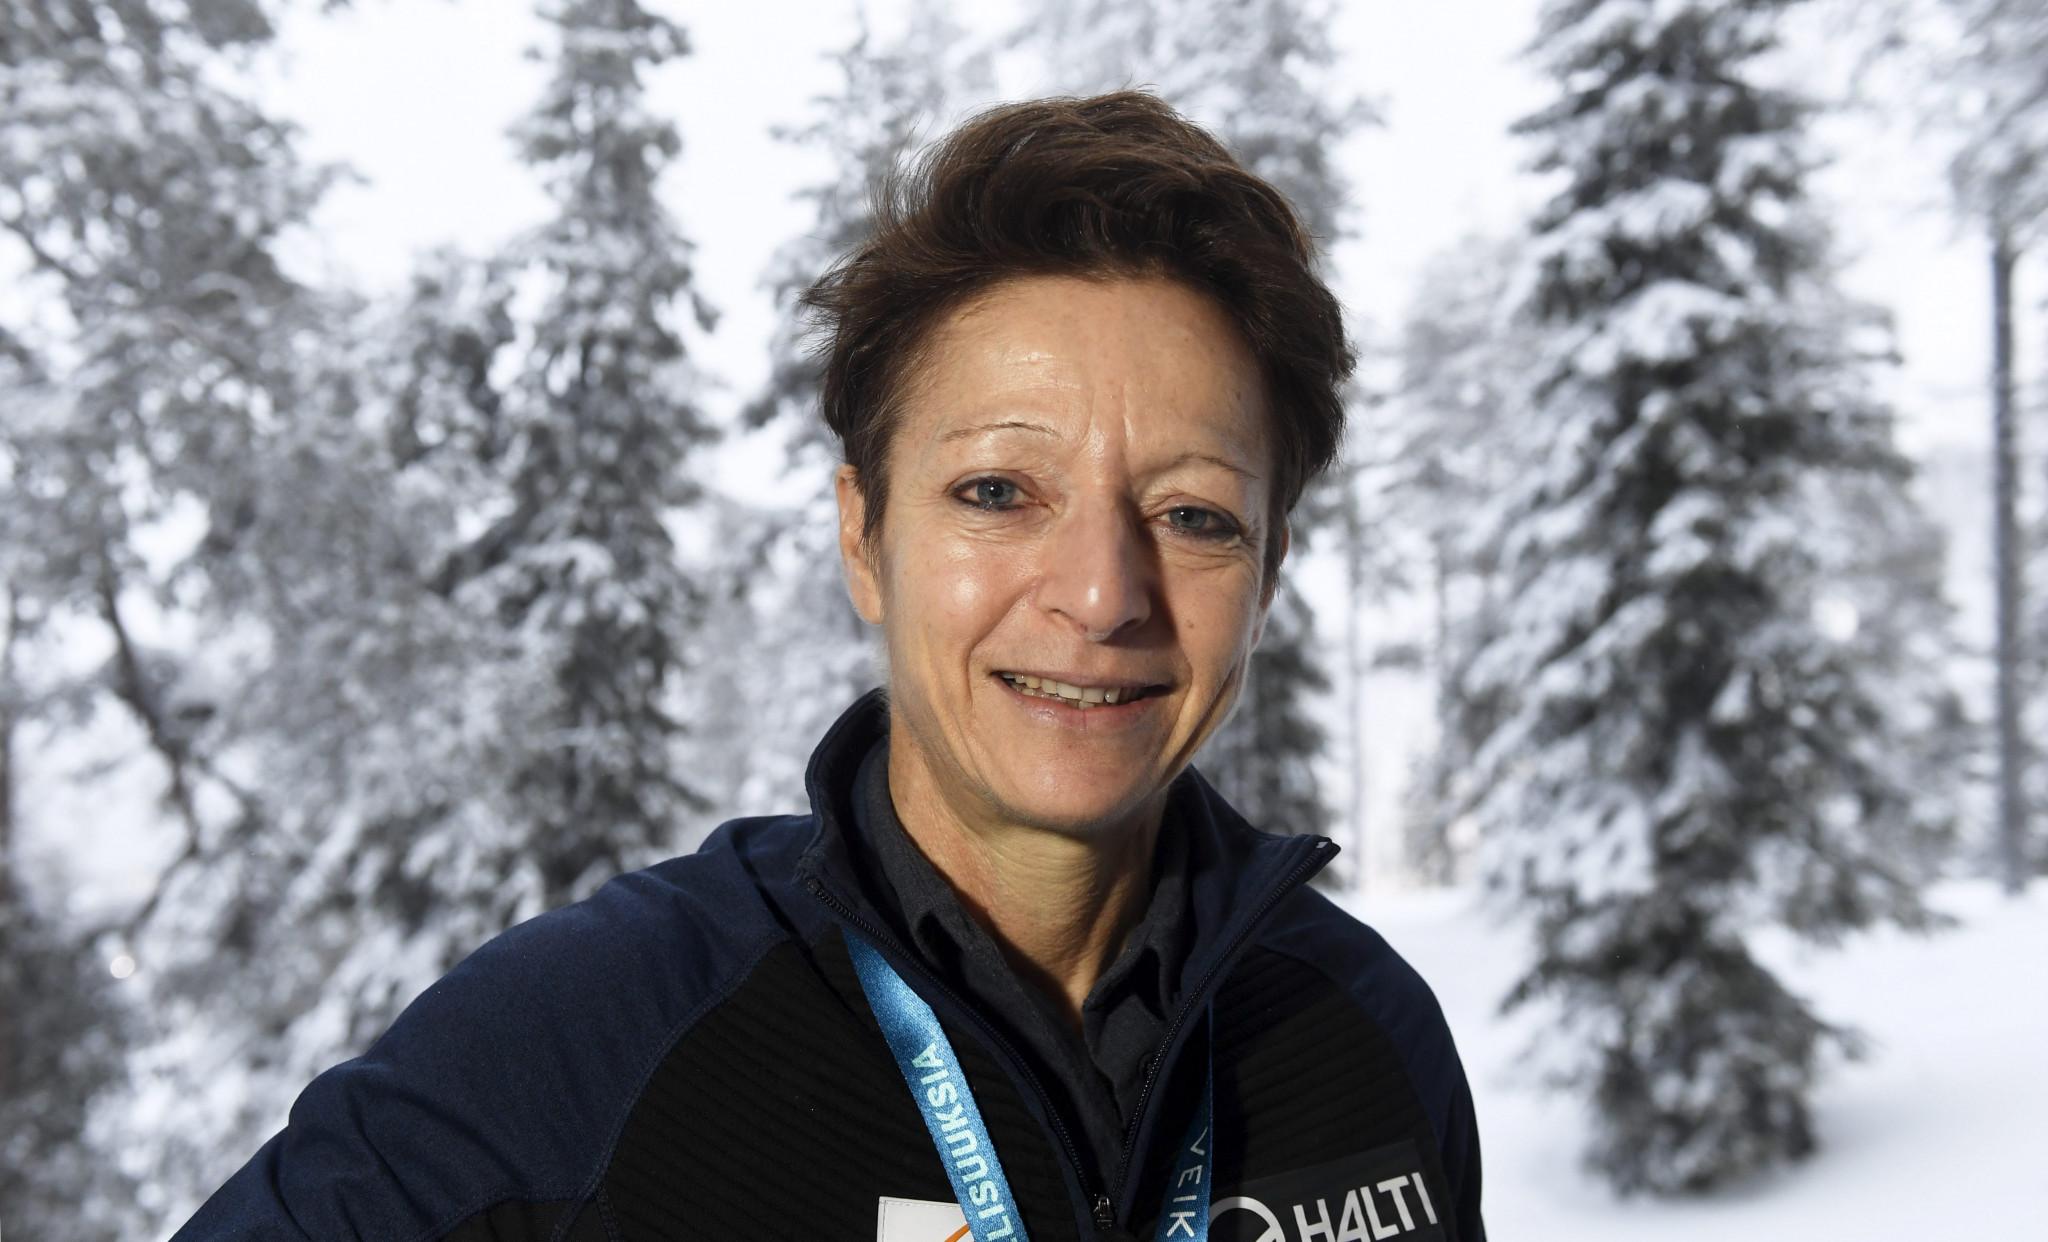 FIS secretary general Sarah Lewis said Oberstdorf 2021 was making